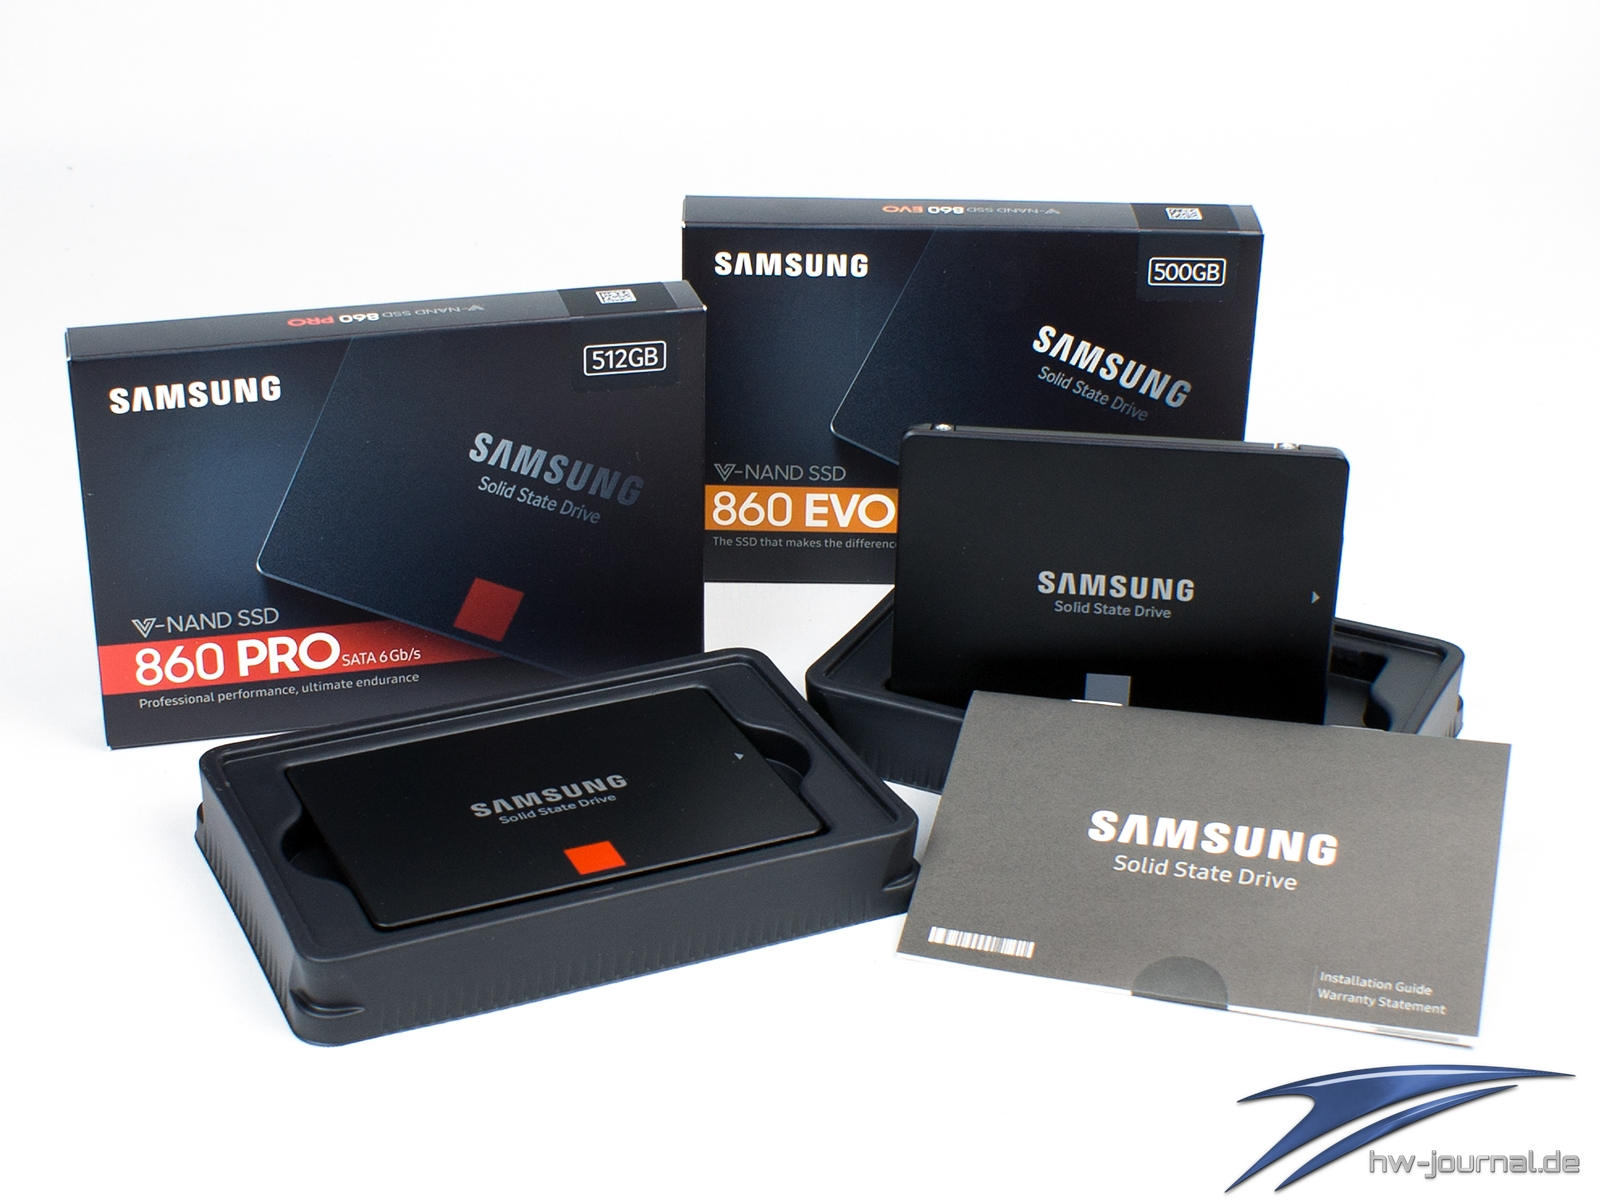 Test: Samsung 860 Evo 500GB & 860 Pro 512GB - Hardware-Journal